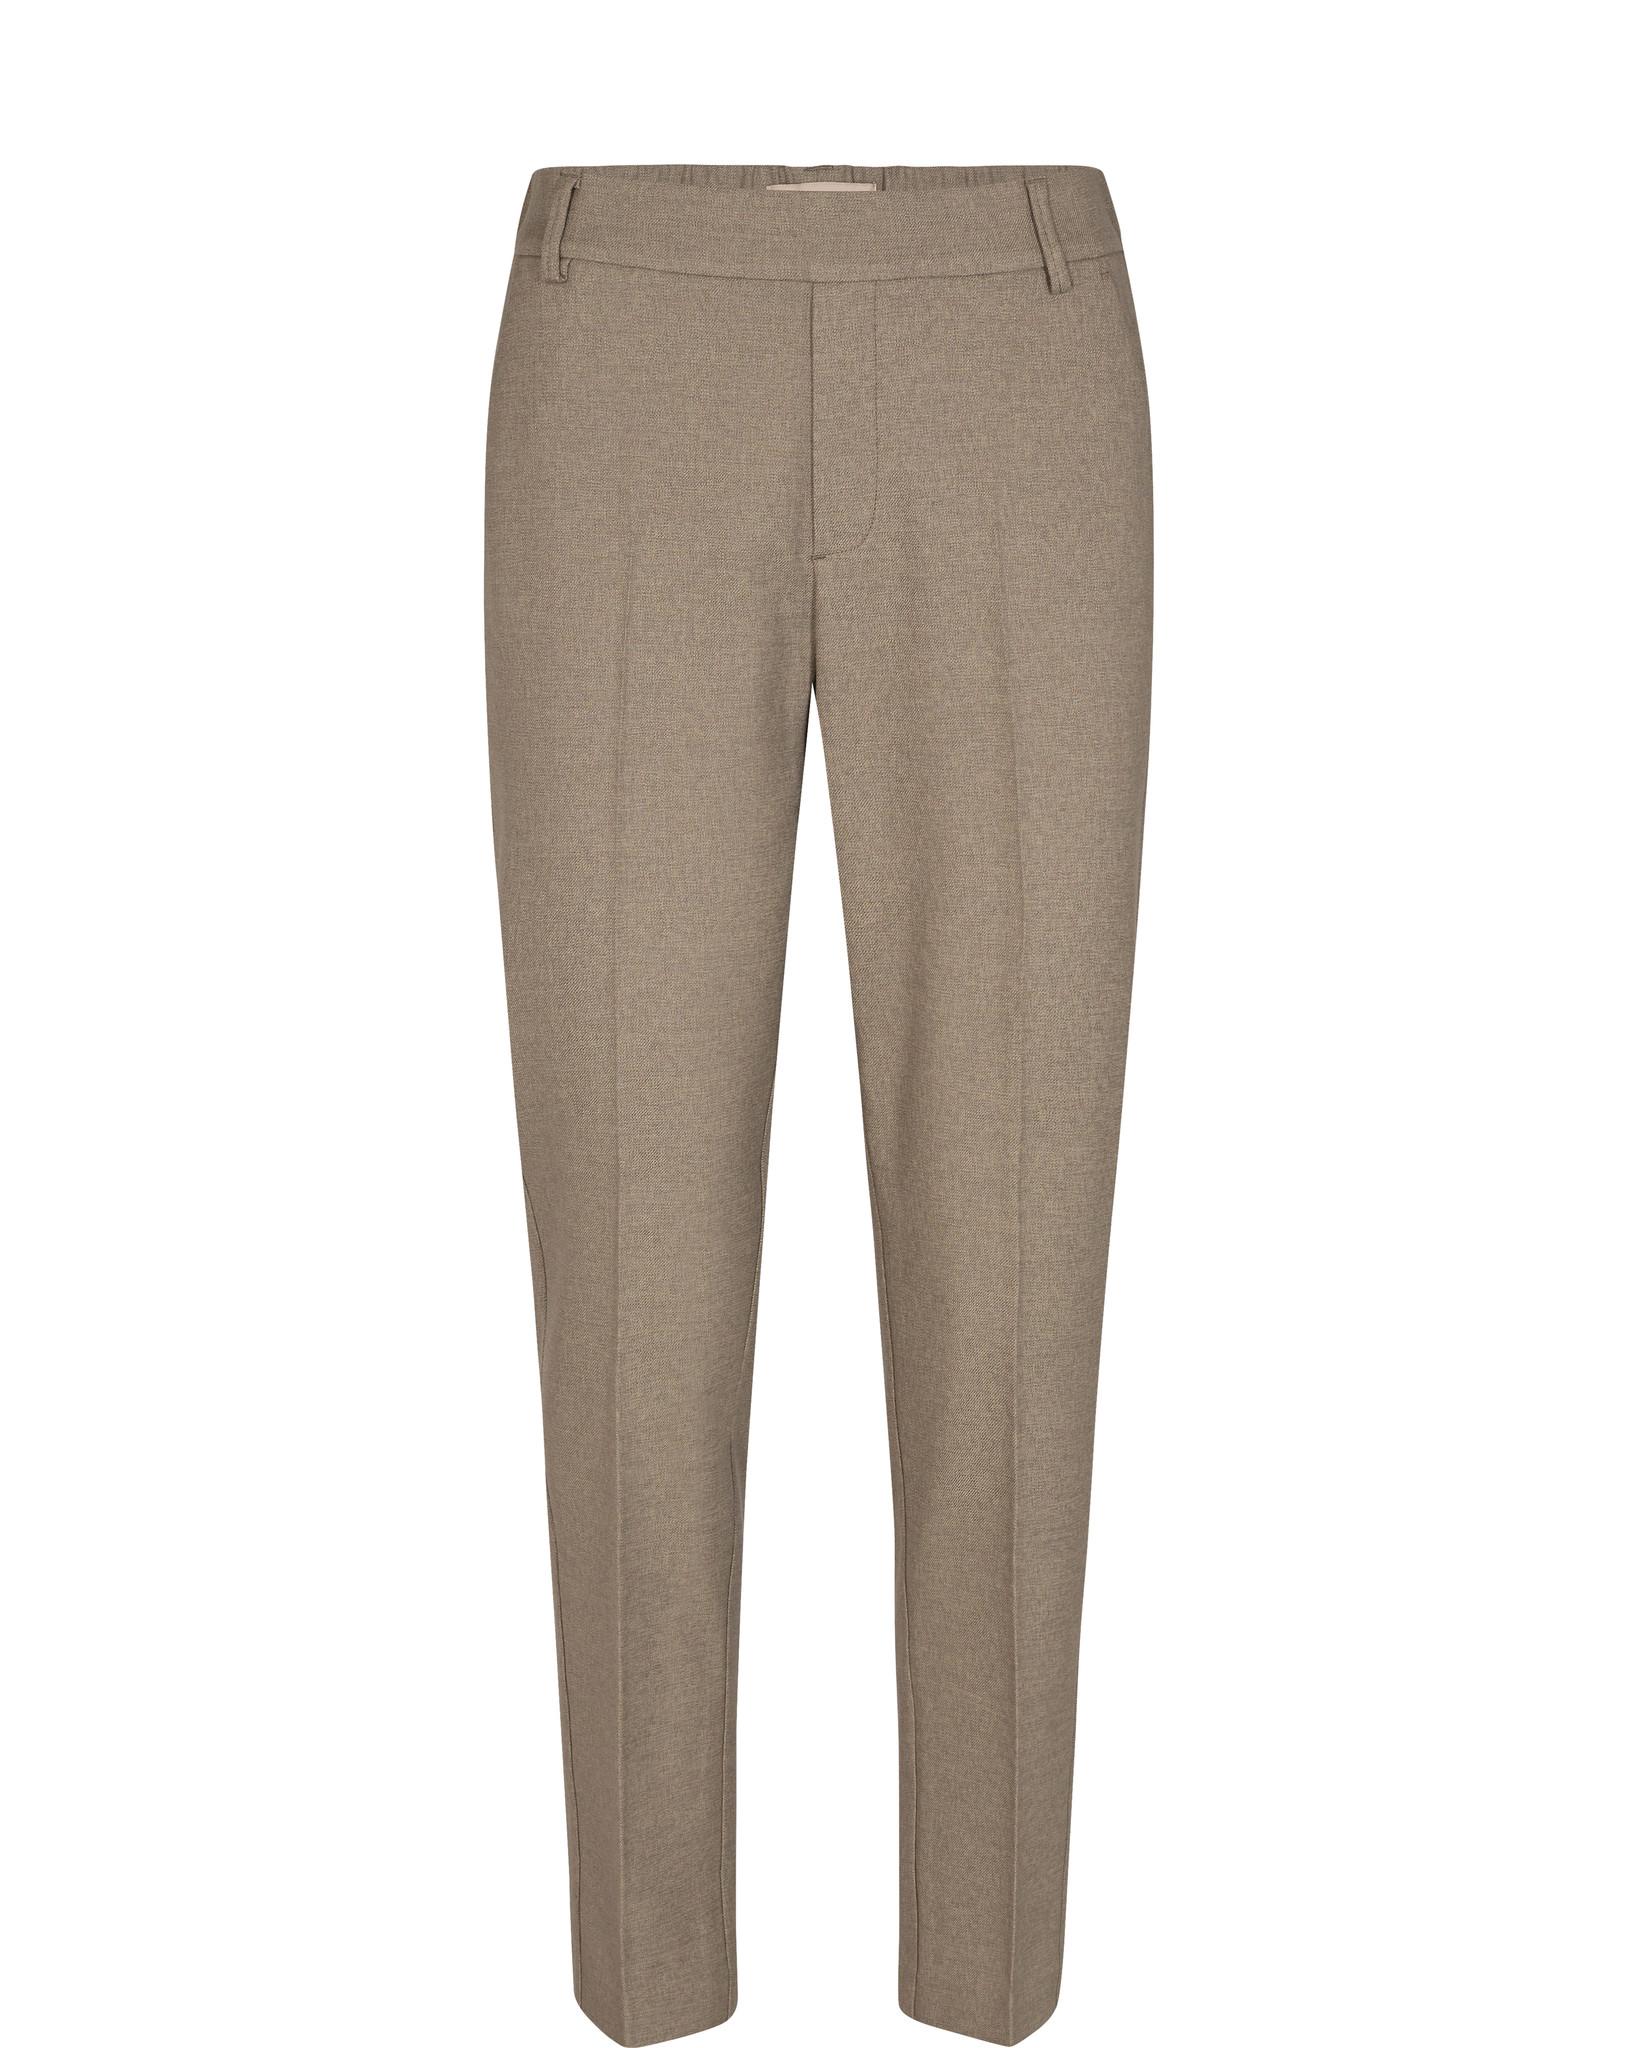 MosMosh Pants 140811 PANTS-1